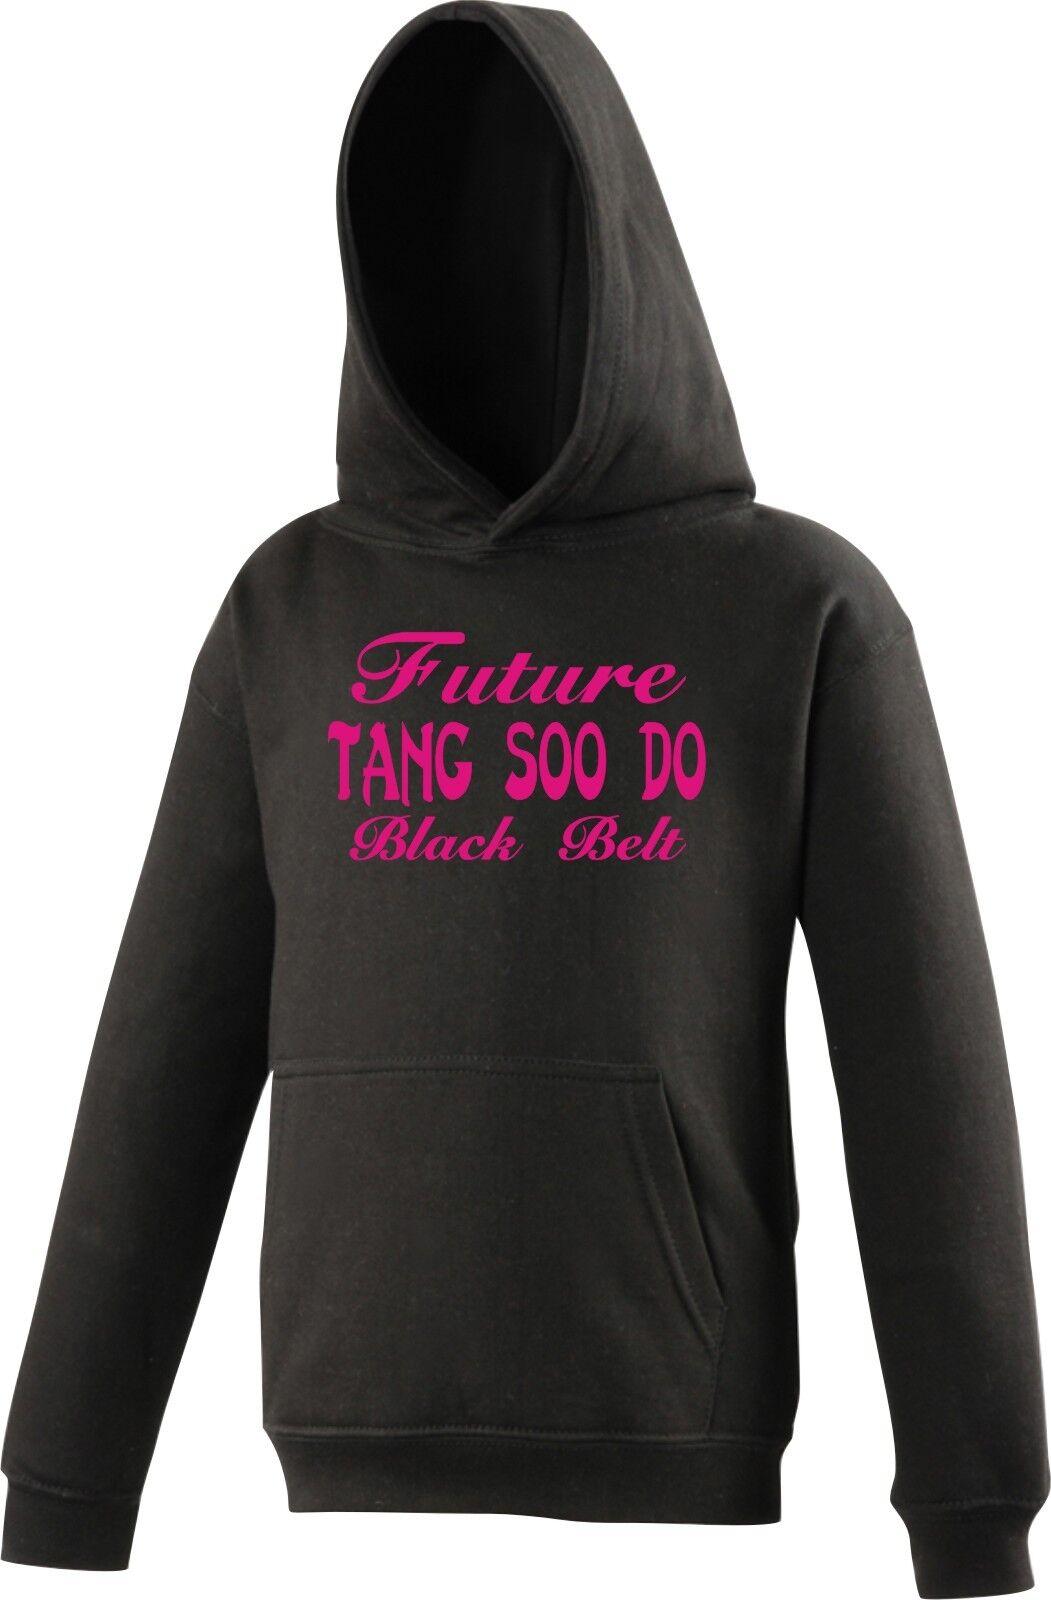 personnalisé enfants pull à capuche Tang Soo Do avenir avenir avenir noir ceinture 4cc520